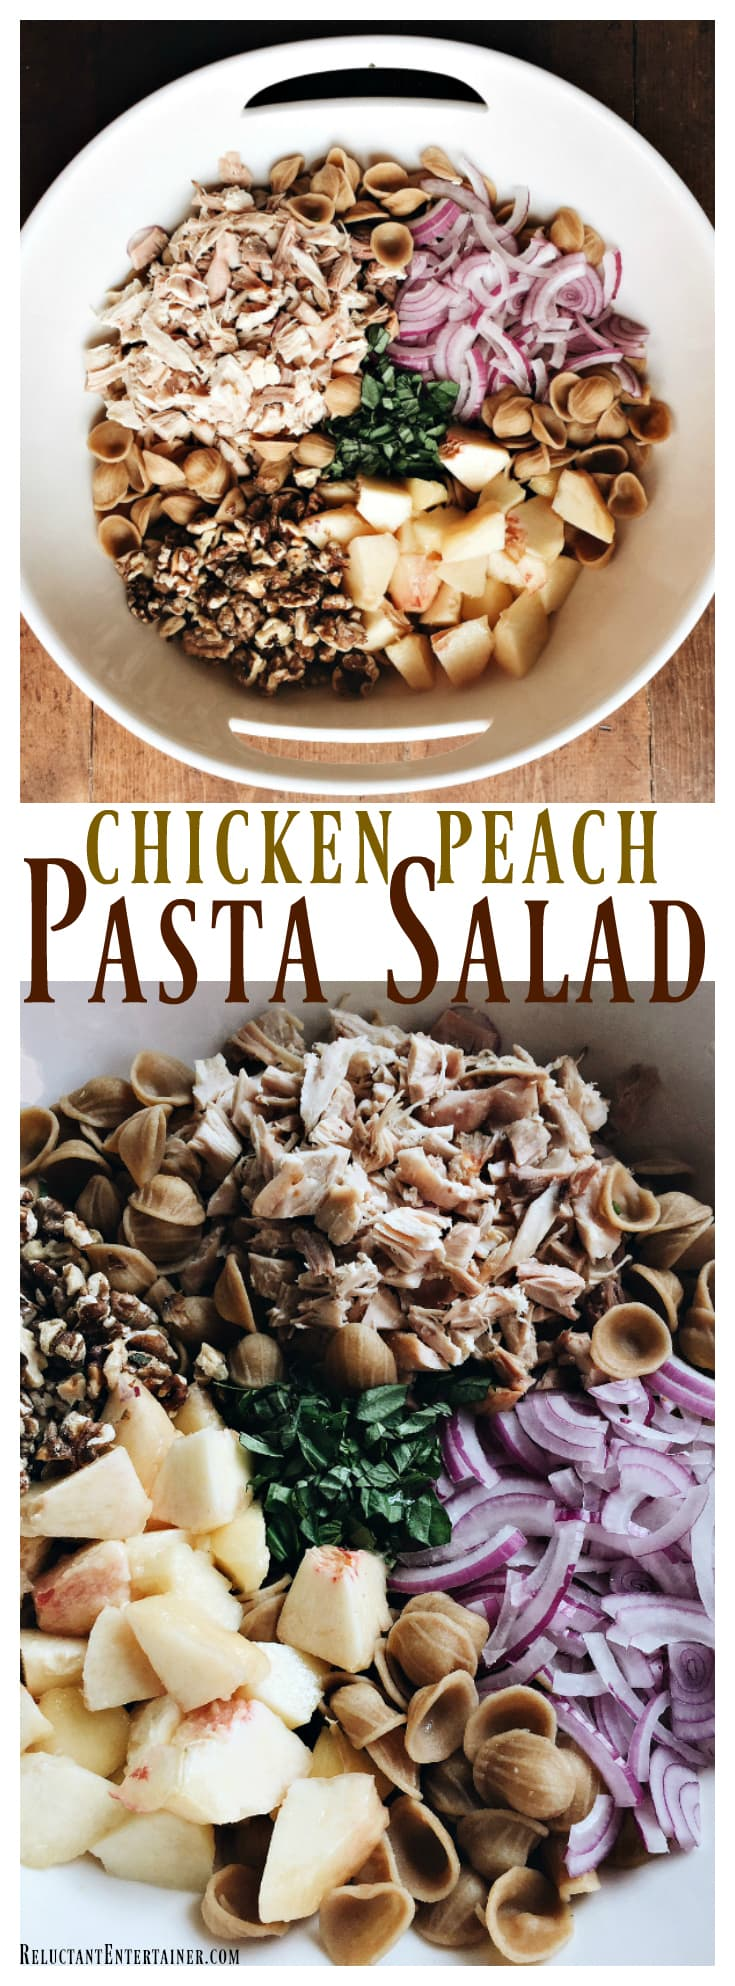 Chicken Peach Pasta Salad for summer entertaining | ReluctantEntertainer.com